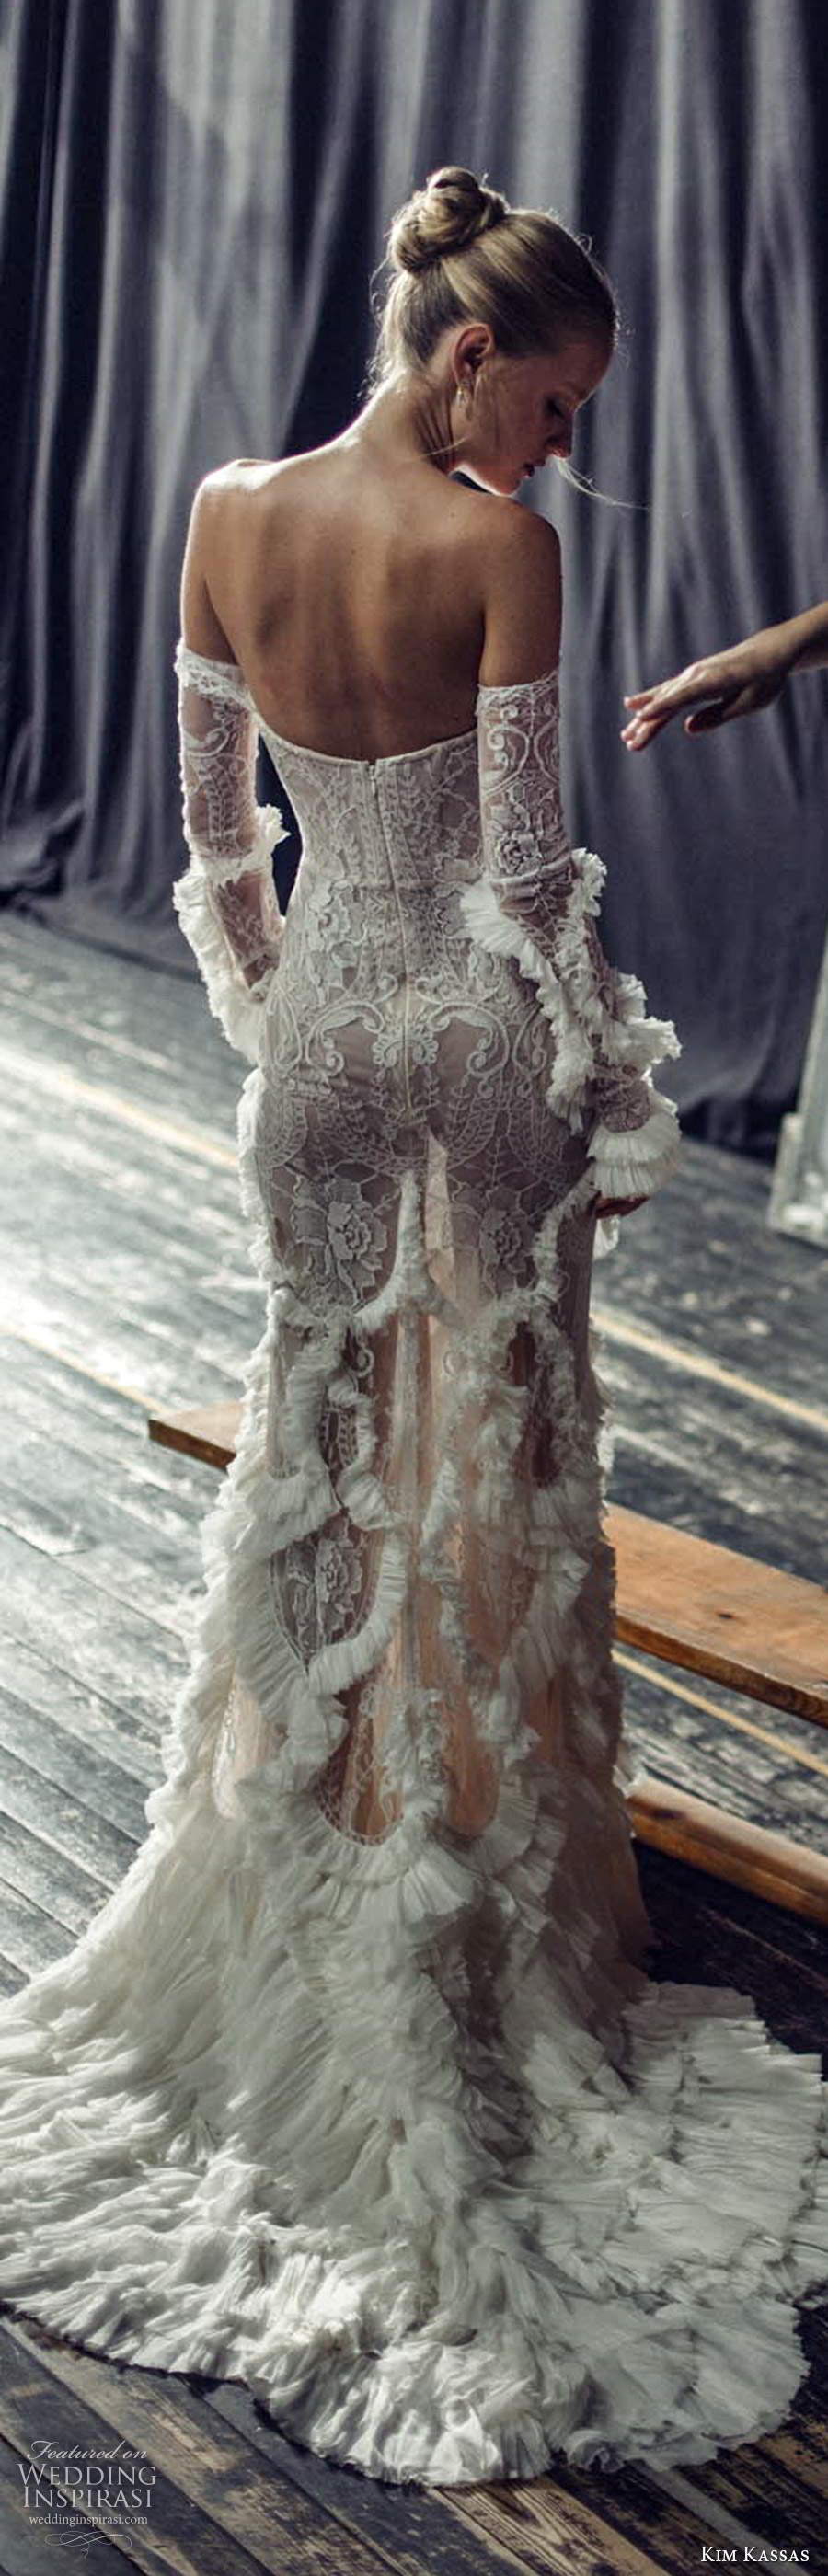 kim kassas fall 2021 bridal detached sleeves gloves strapless semi sweetheart neckline fully embellished lace sheath wedding dress chapel train (5) lv